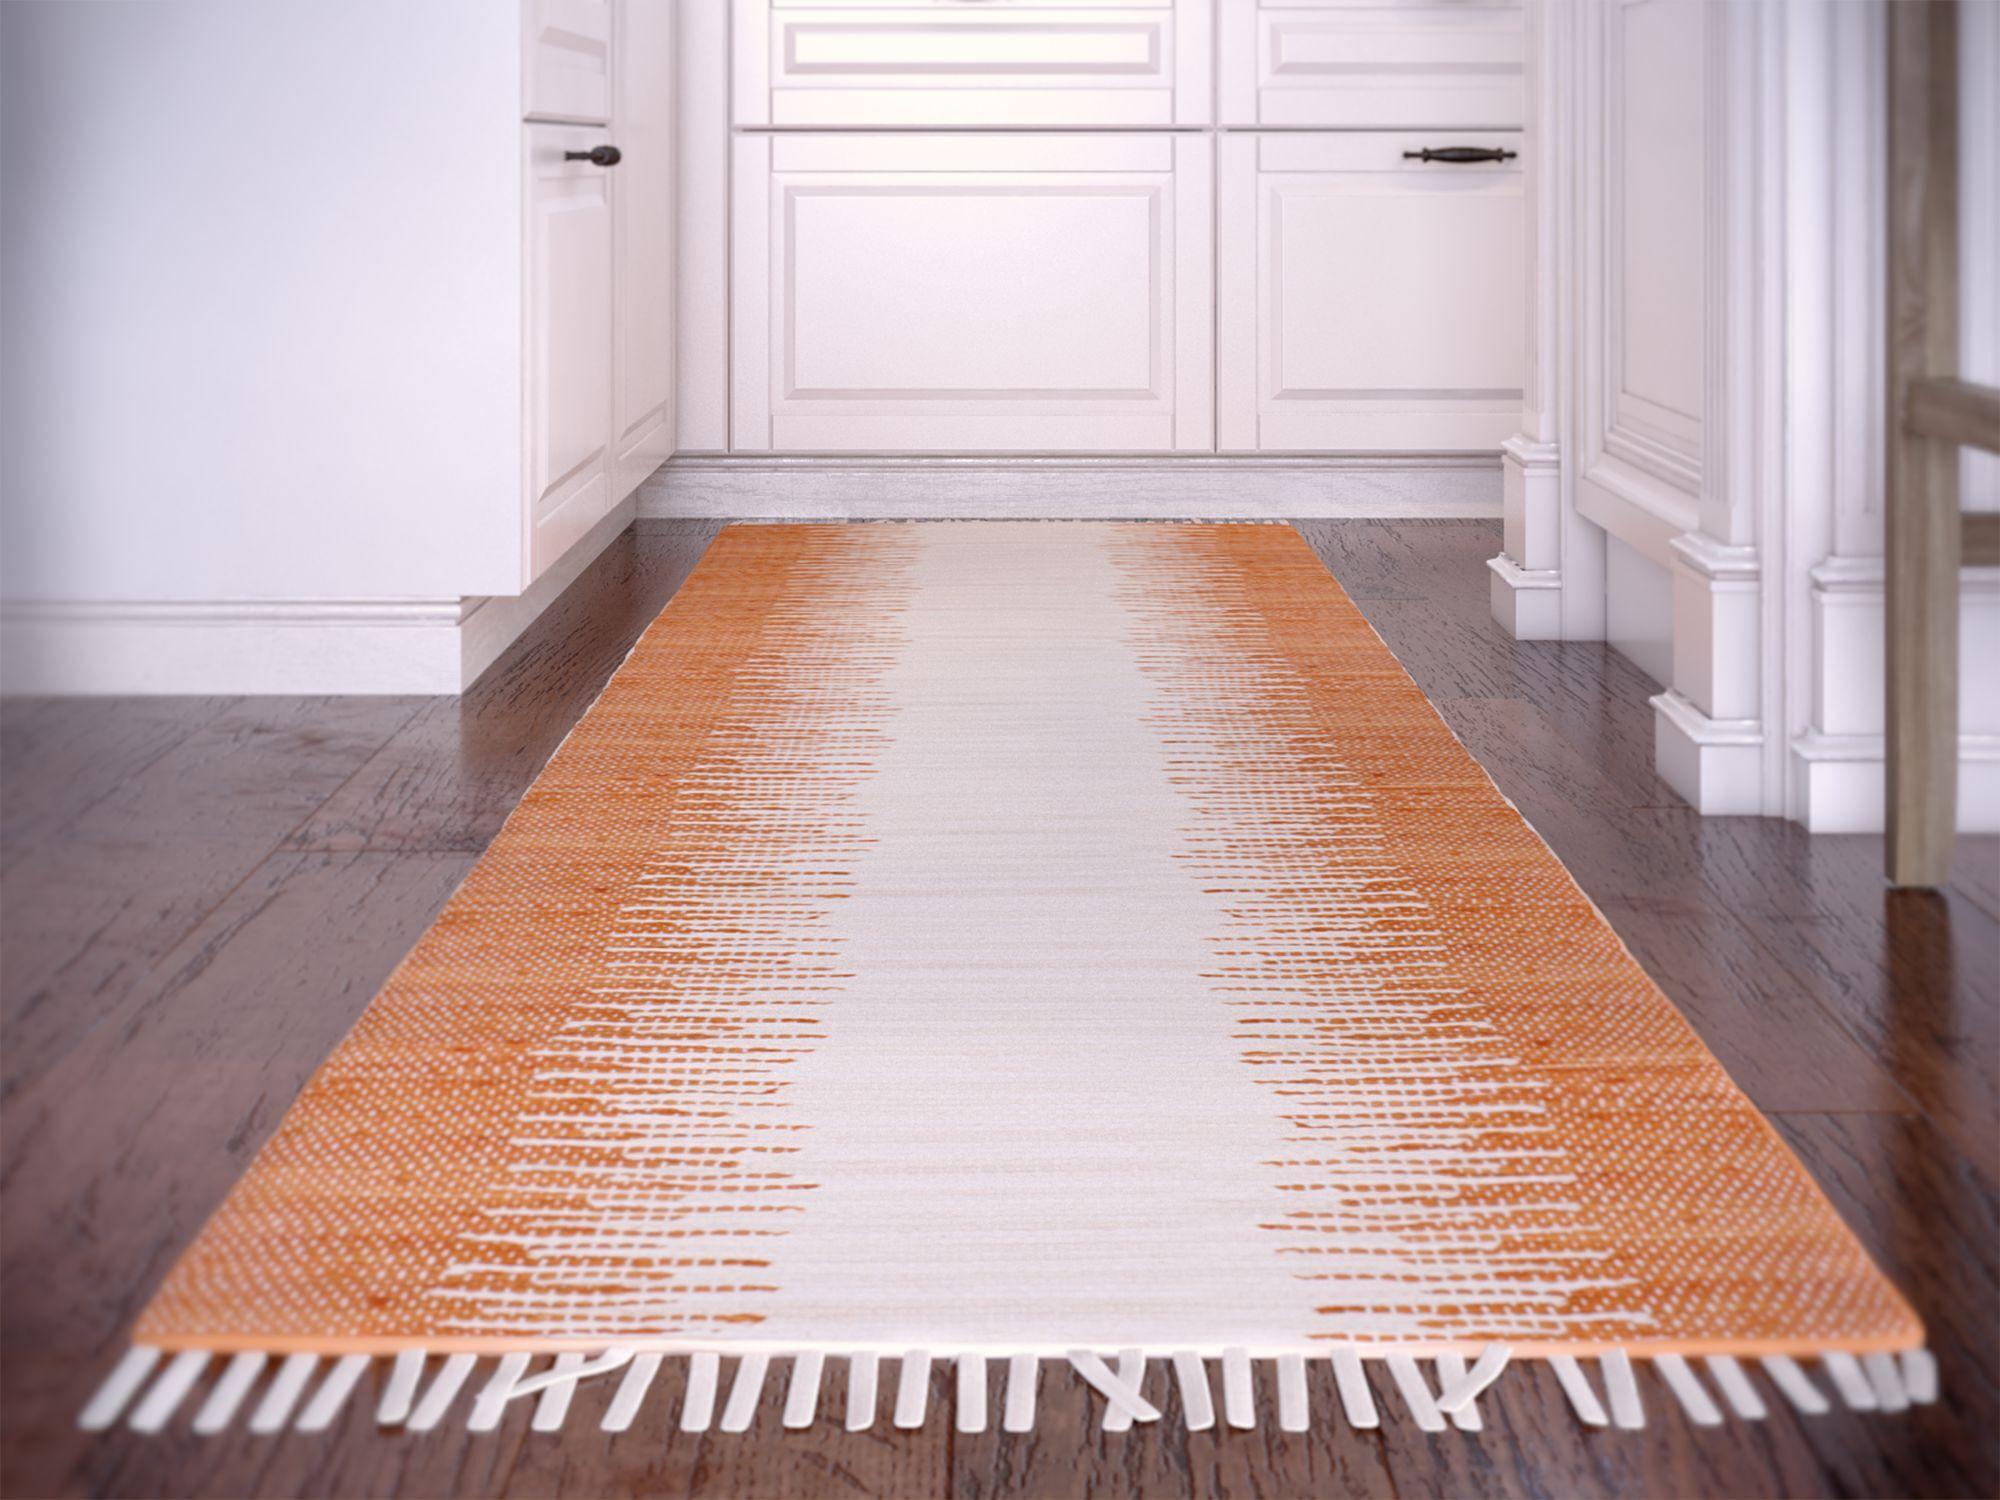 Shenandoah Hand-Woven Cotton Orange/White Area Rug Rug Size: Rectangle 2'6